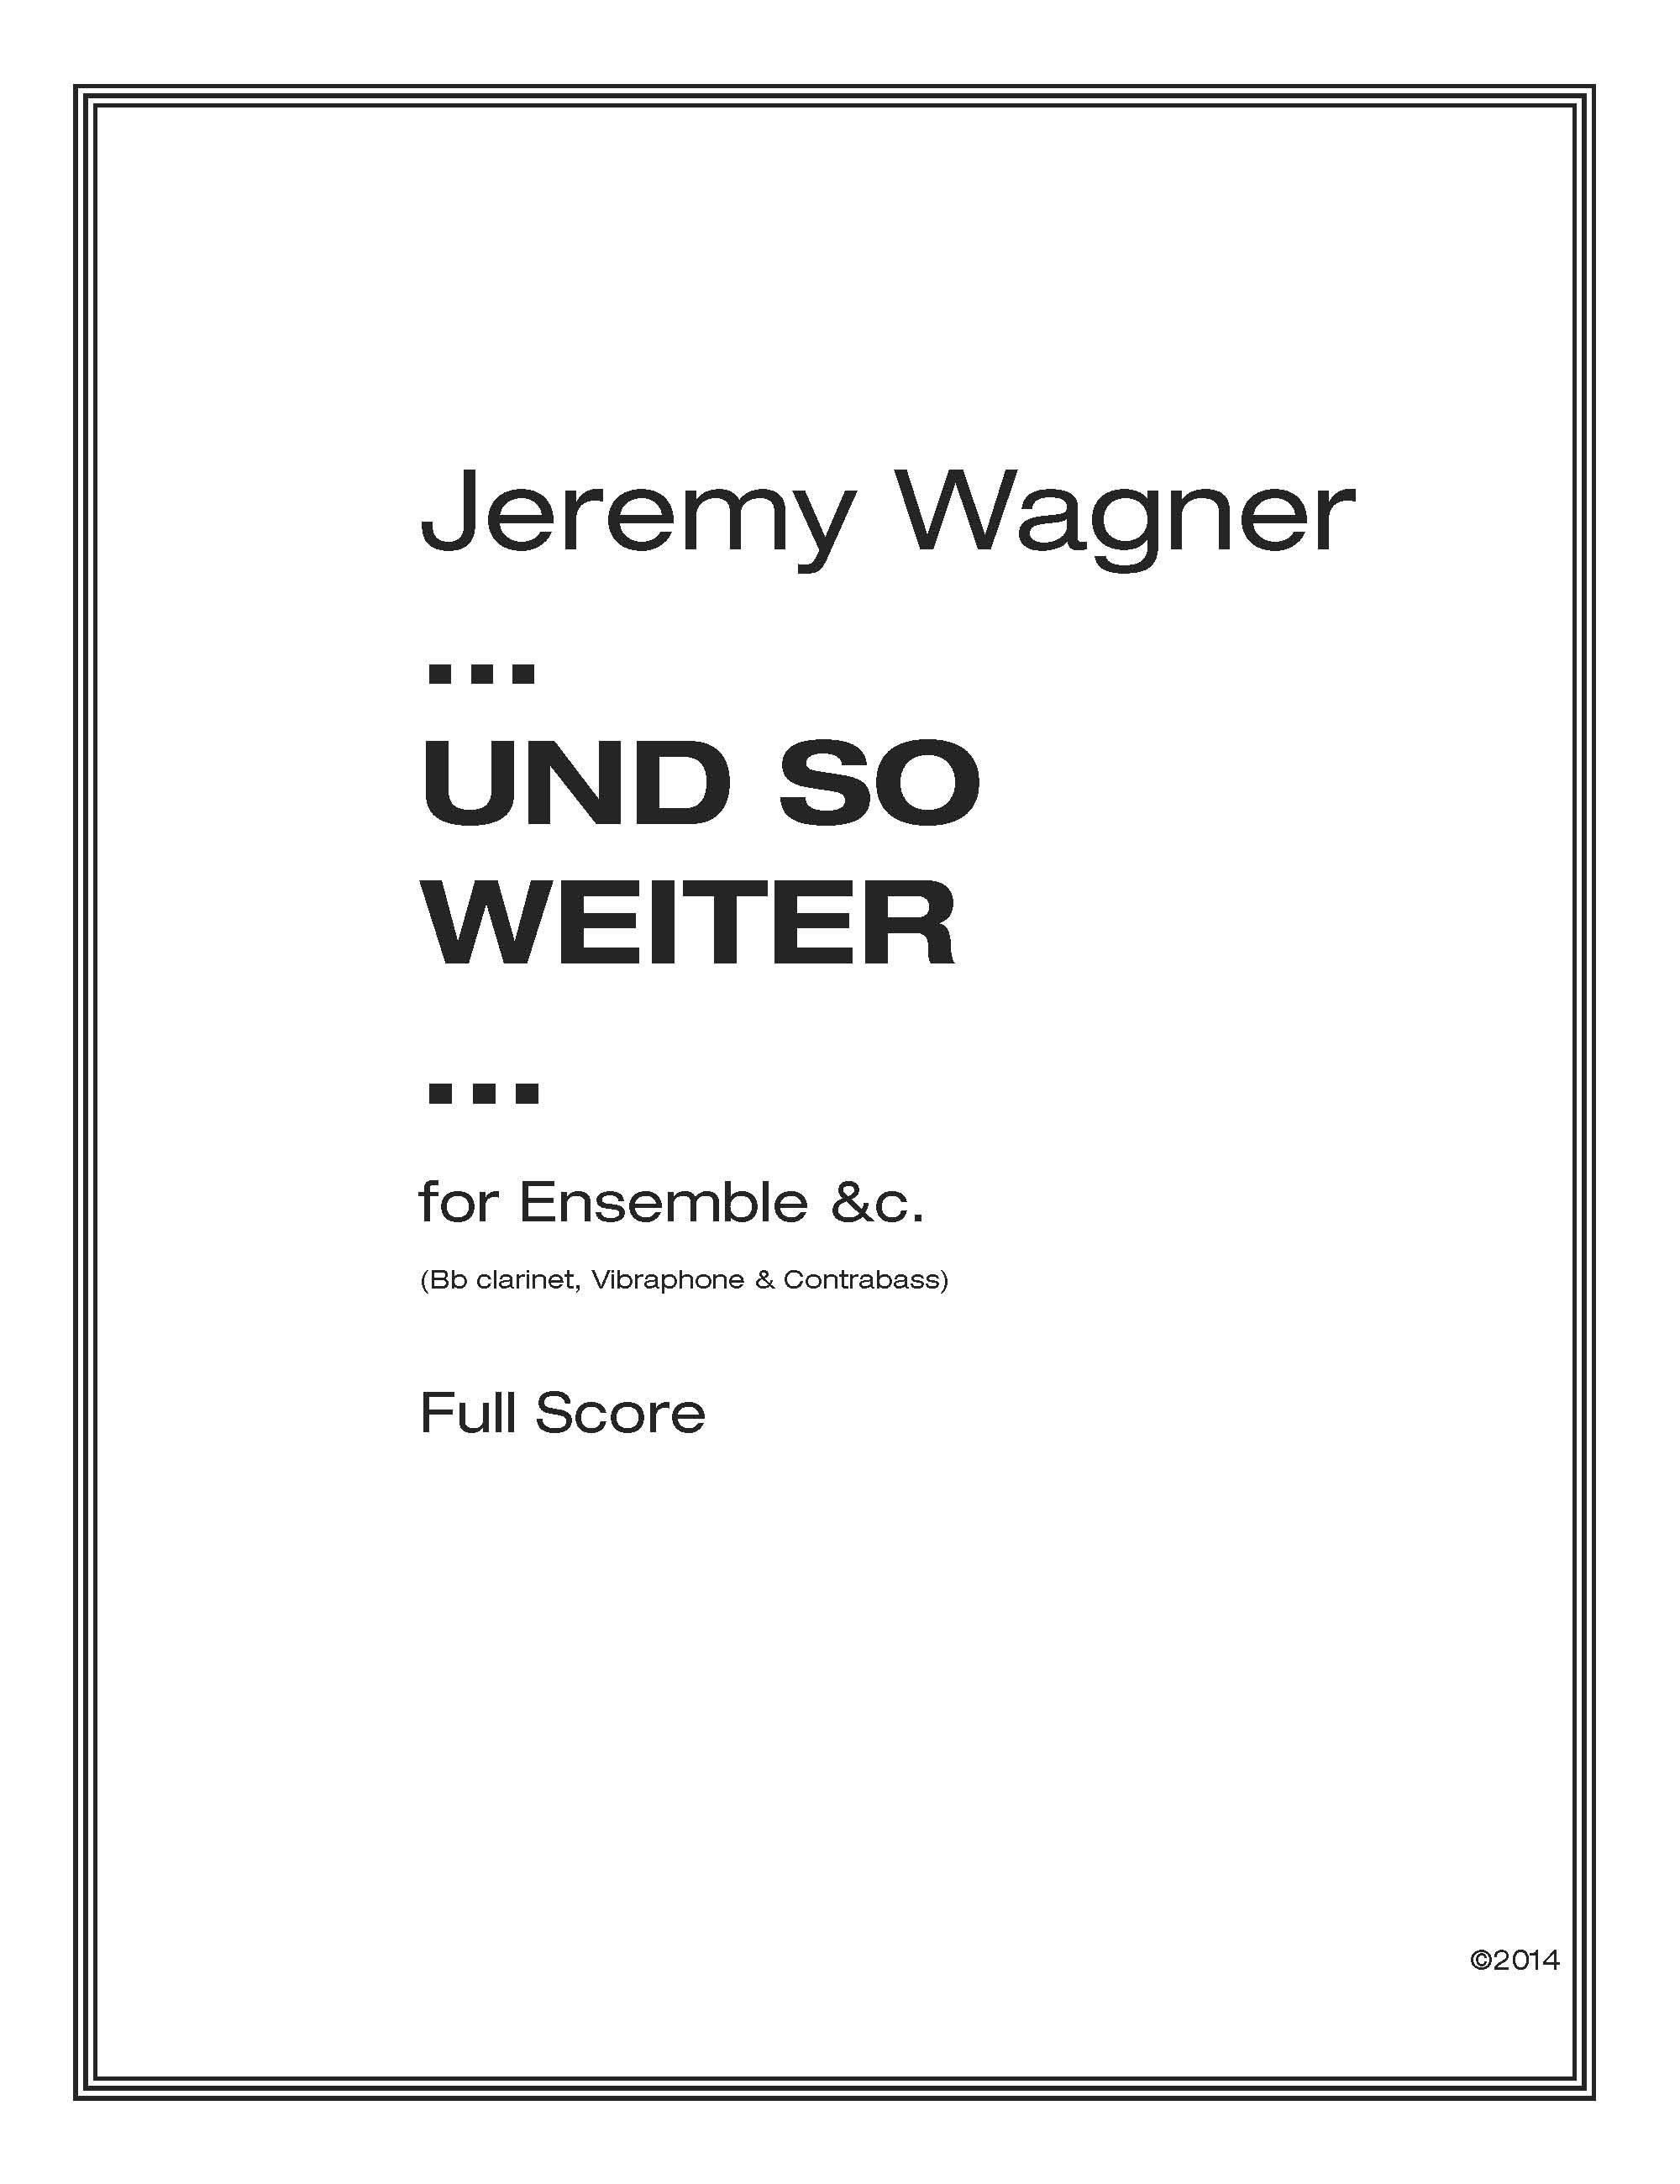 Click to view score